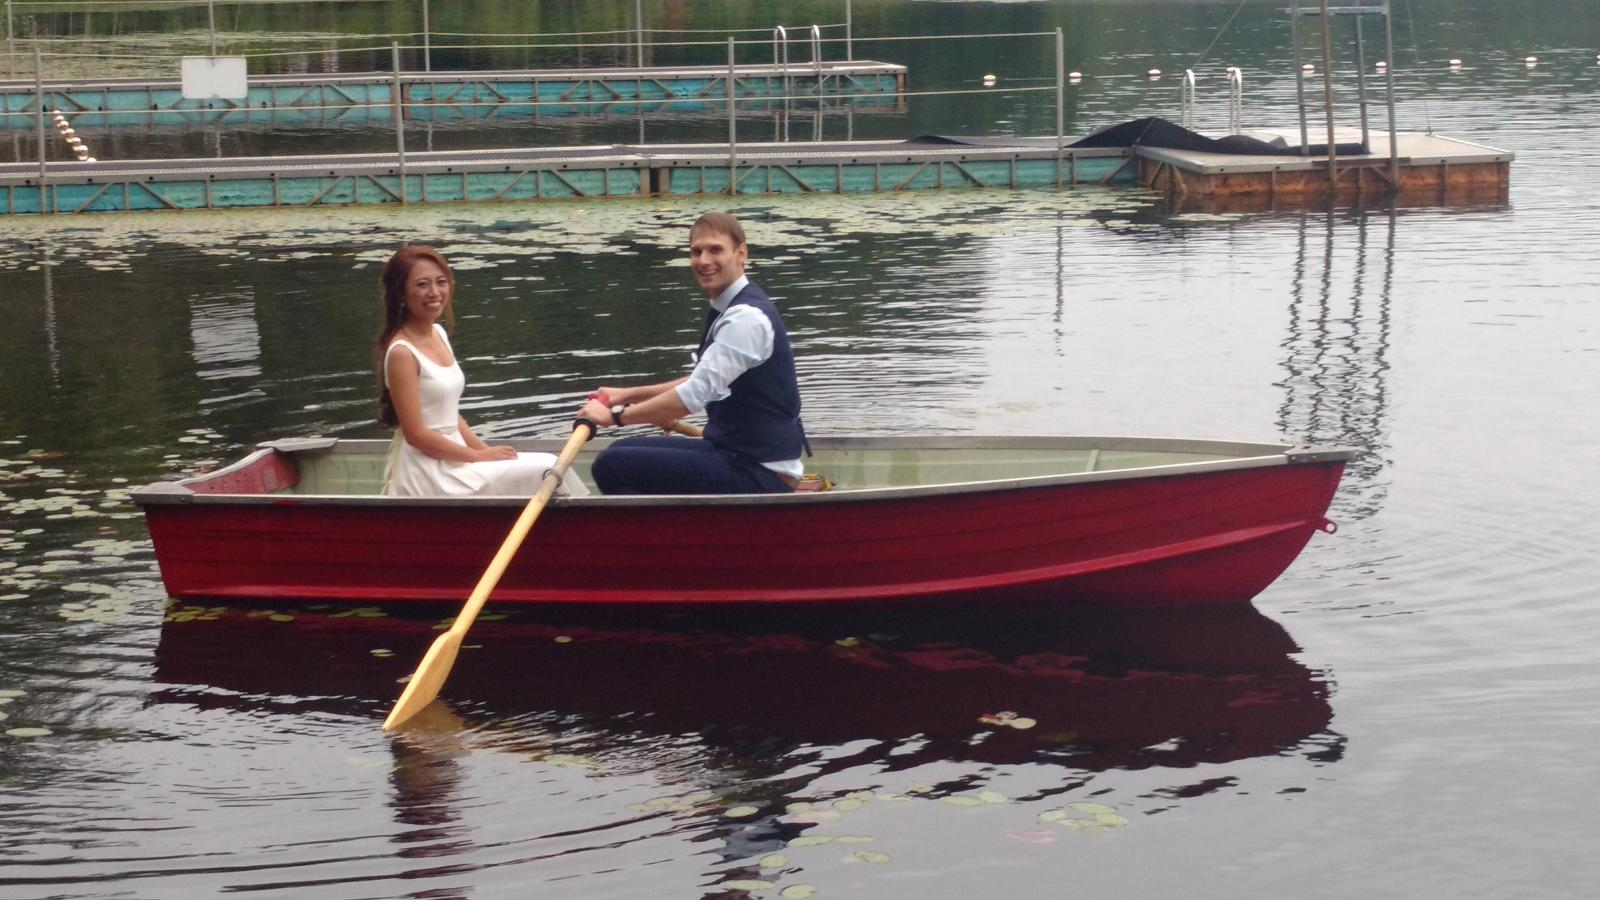 Airey & Manuel September 2018 wedding!